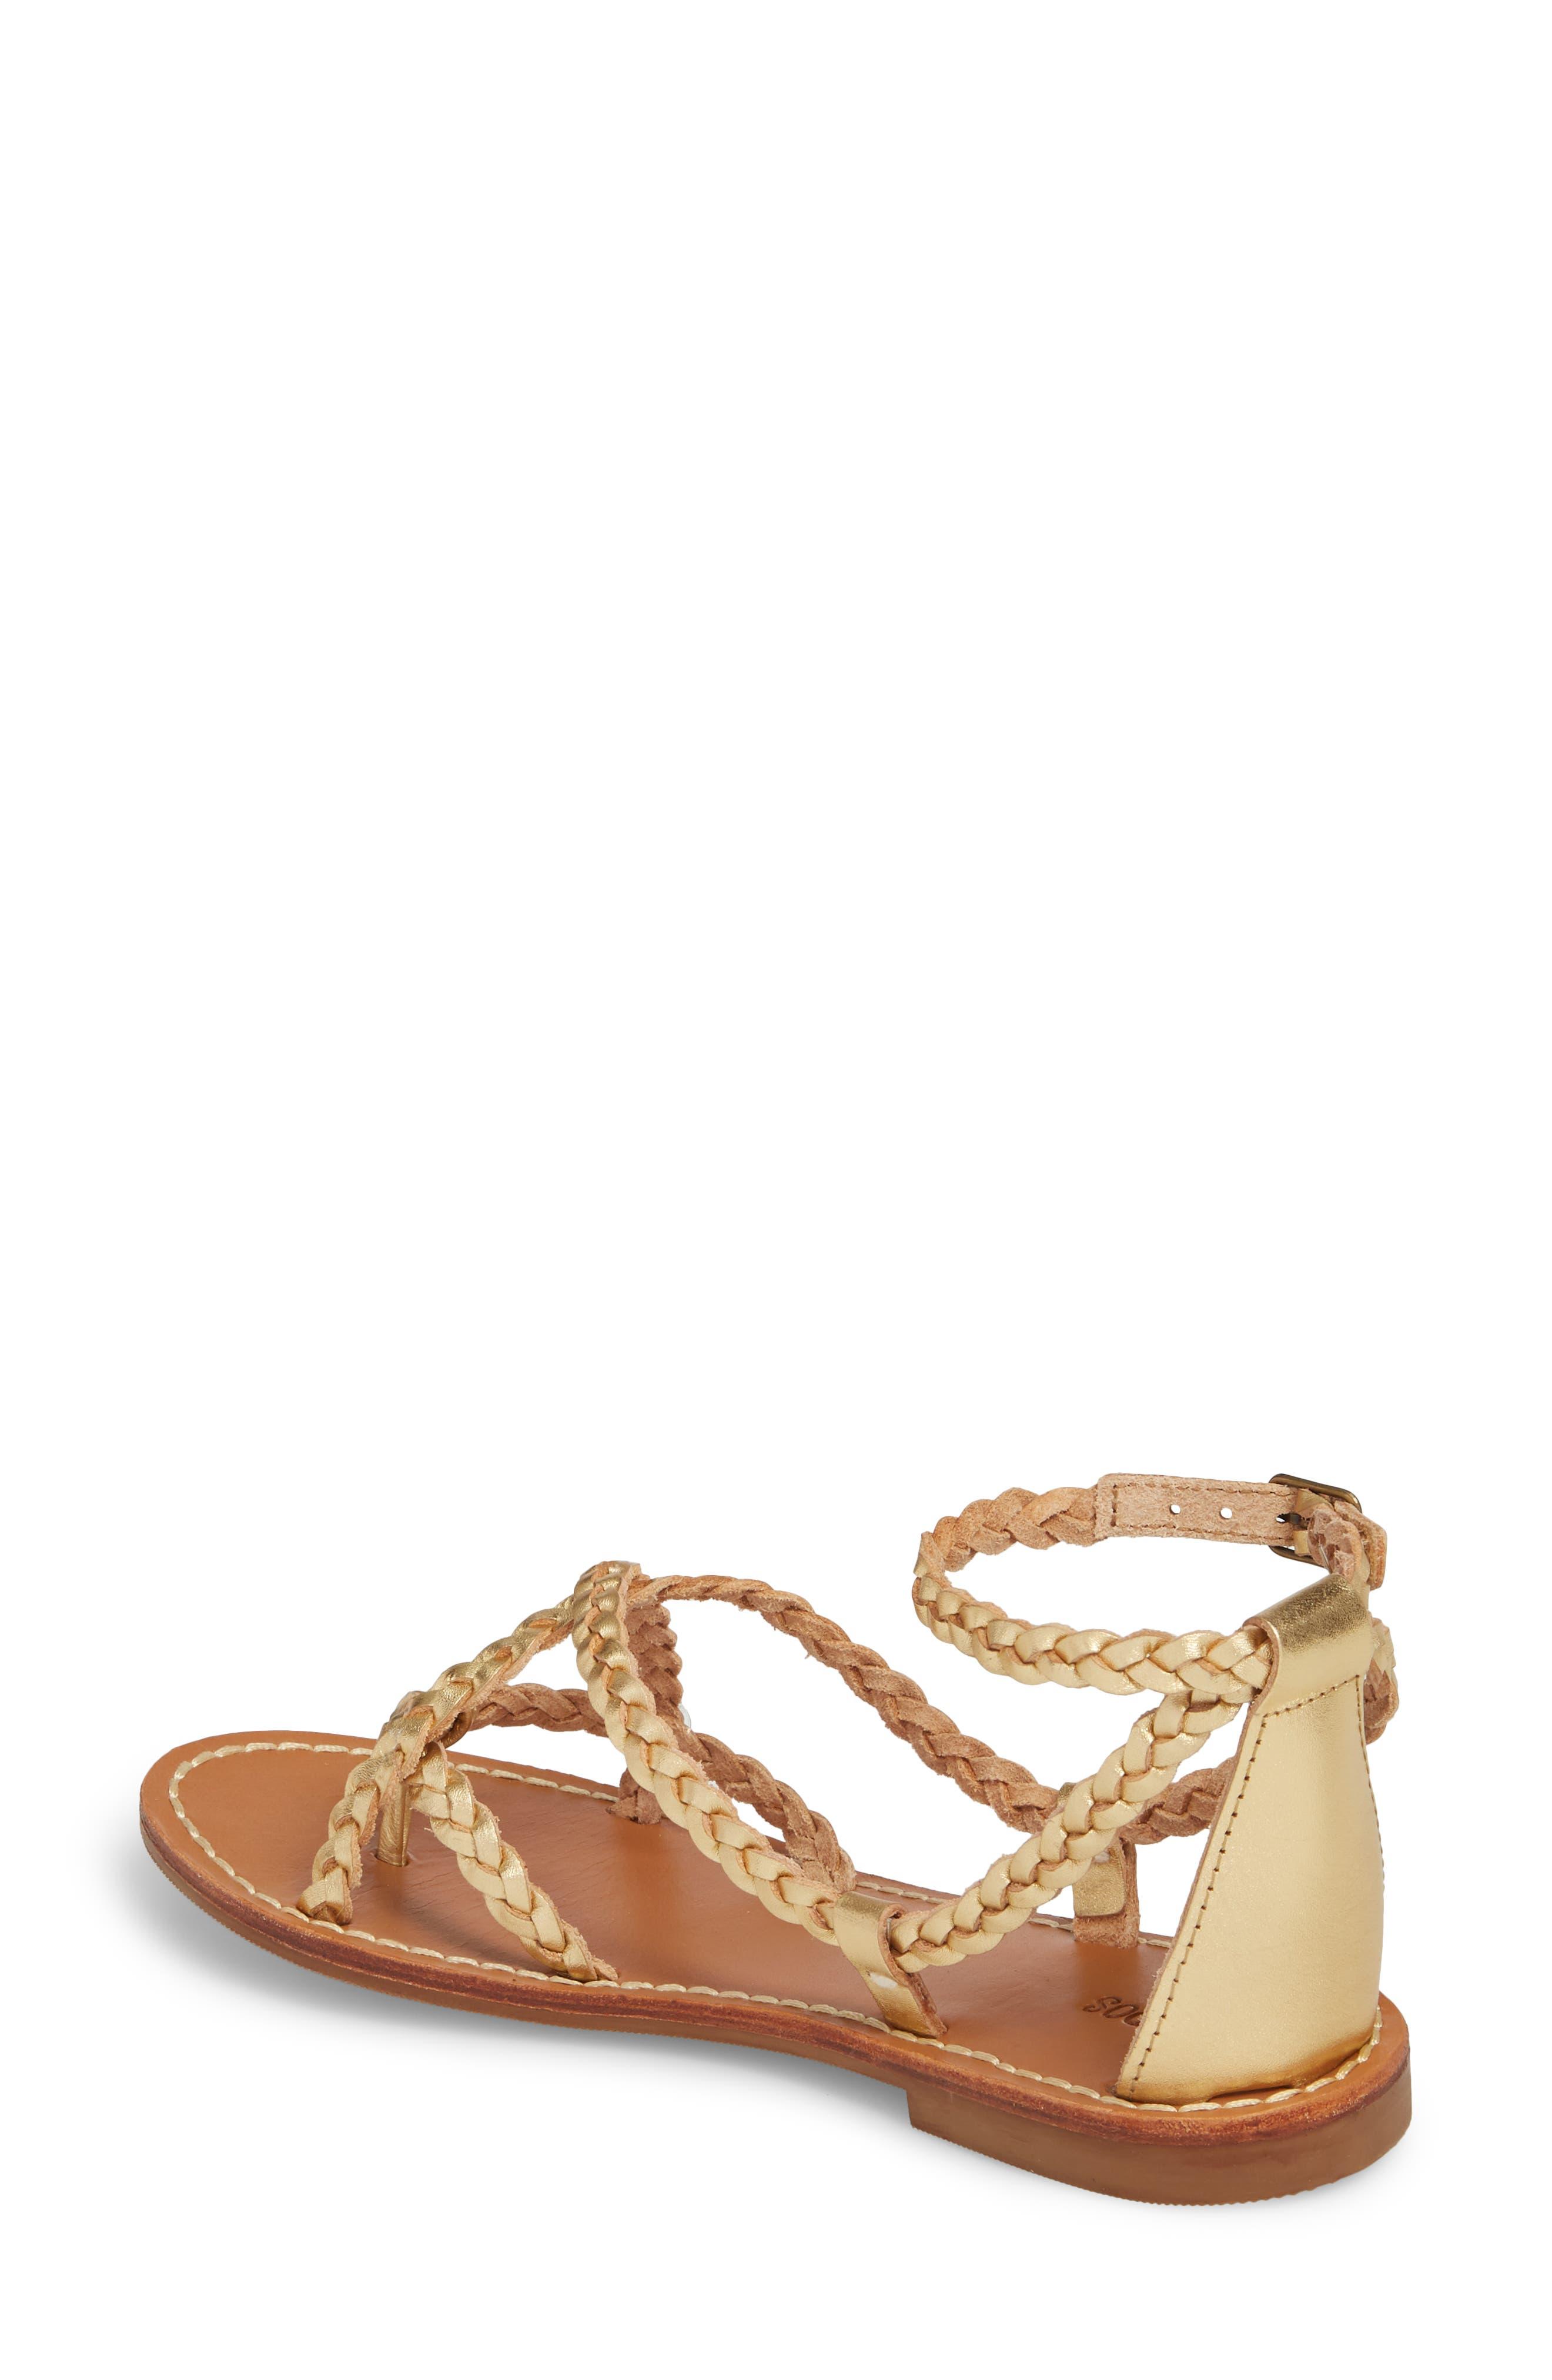 Amalfi Braided Metallic Sandal,                             Alternate thumbnail 2, color,                             710